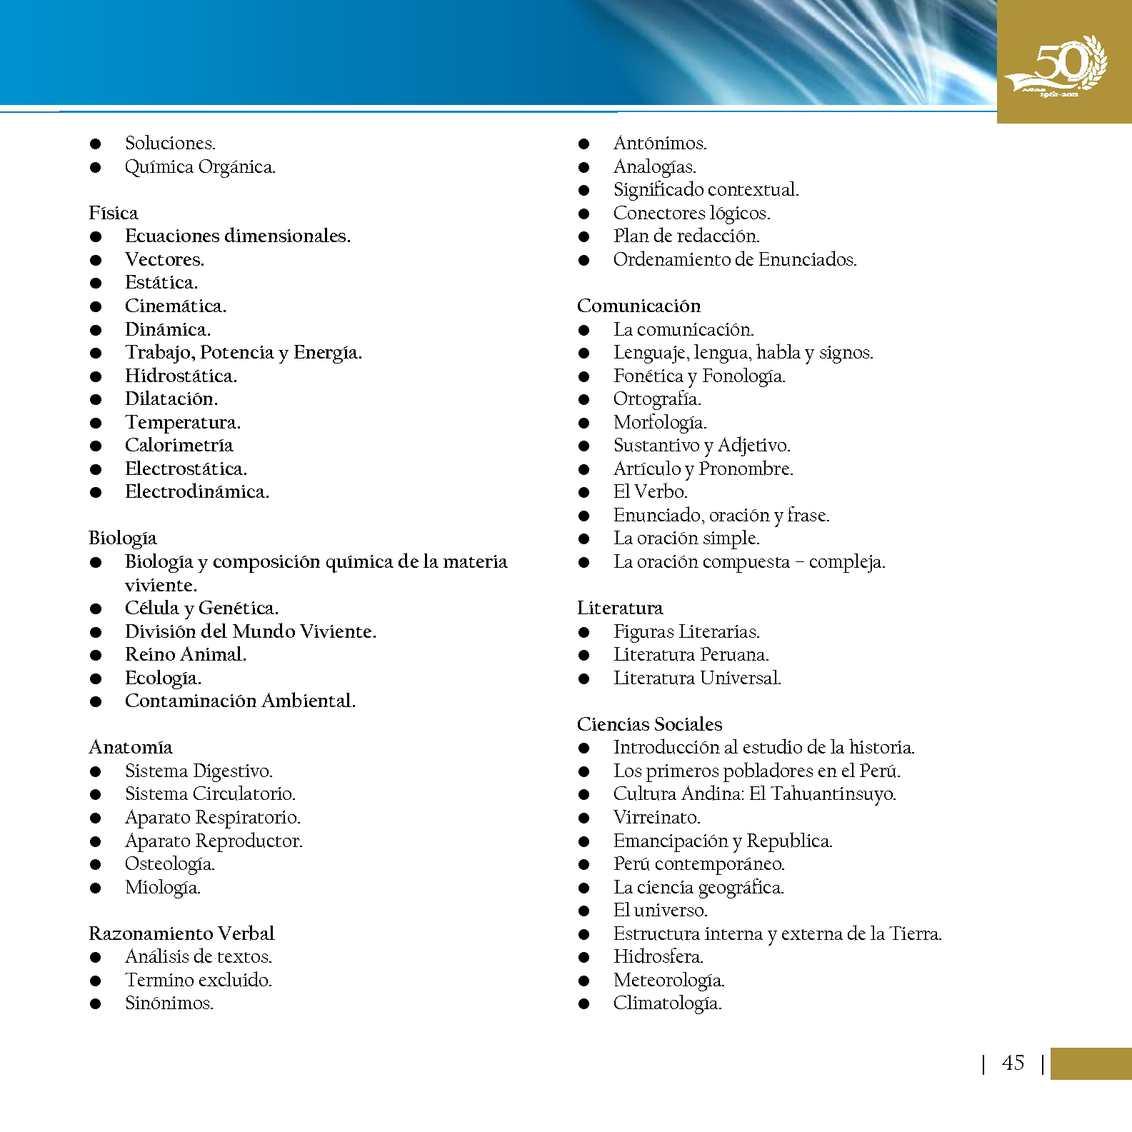 Prospecto De Examen Extraordinario 2012 Calameo Downloader